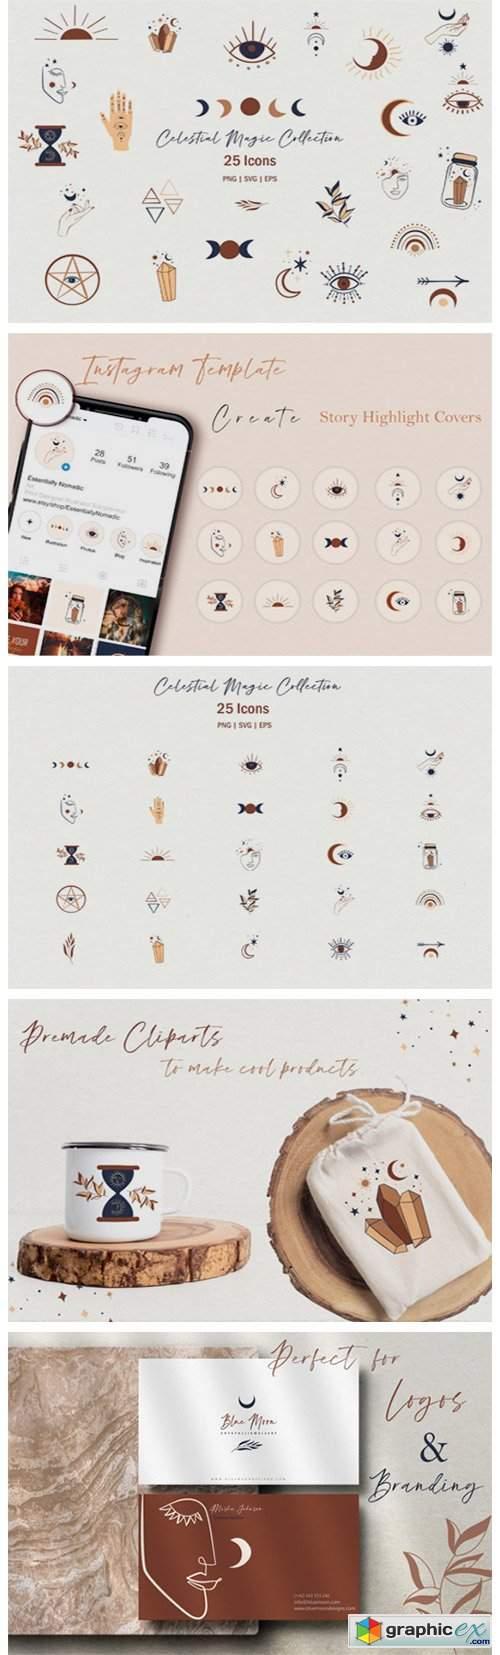 Celestial Magic Clipart Set